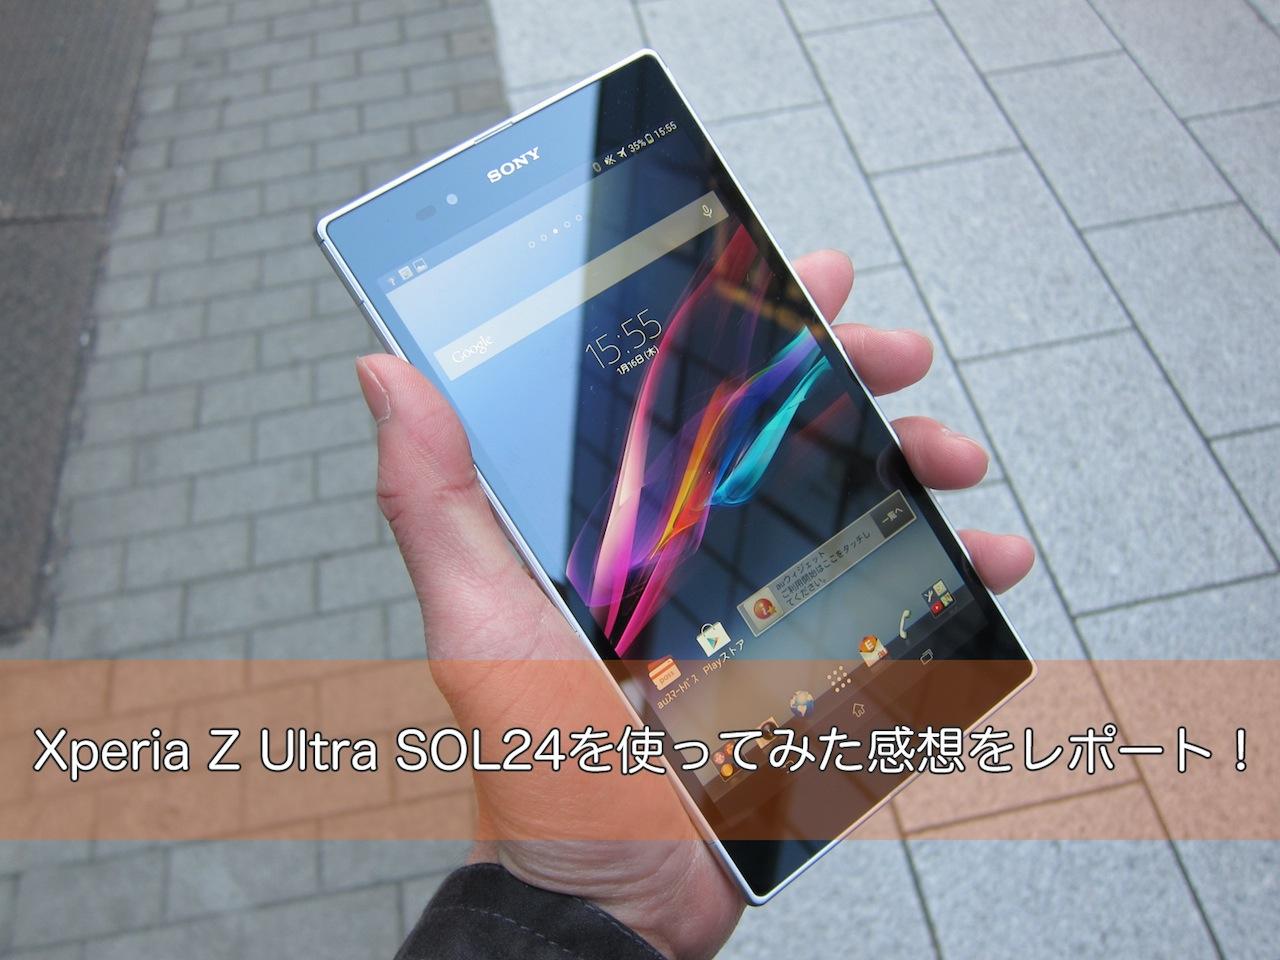 auの2014年春モデル「Xperia Z Ultra SOL24」を使ってみた感想をレポート!